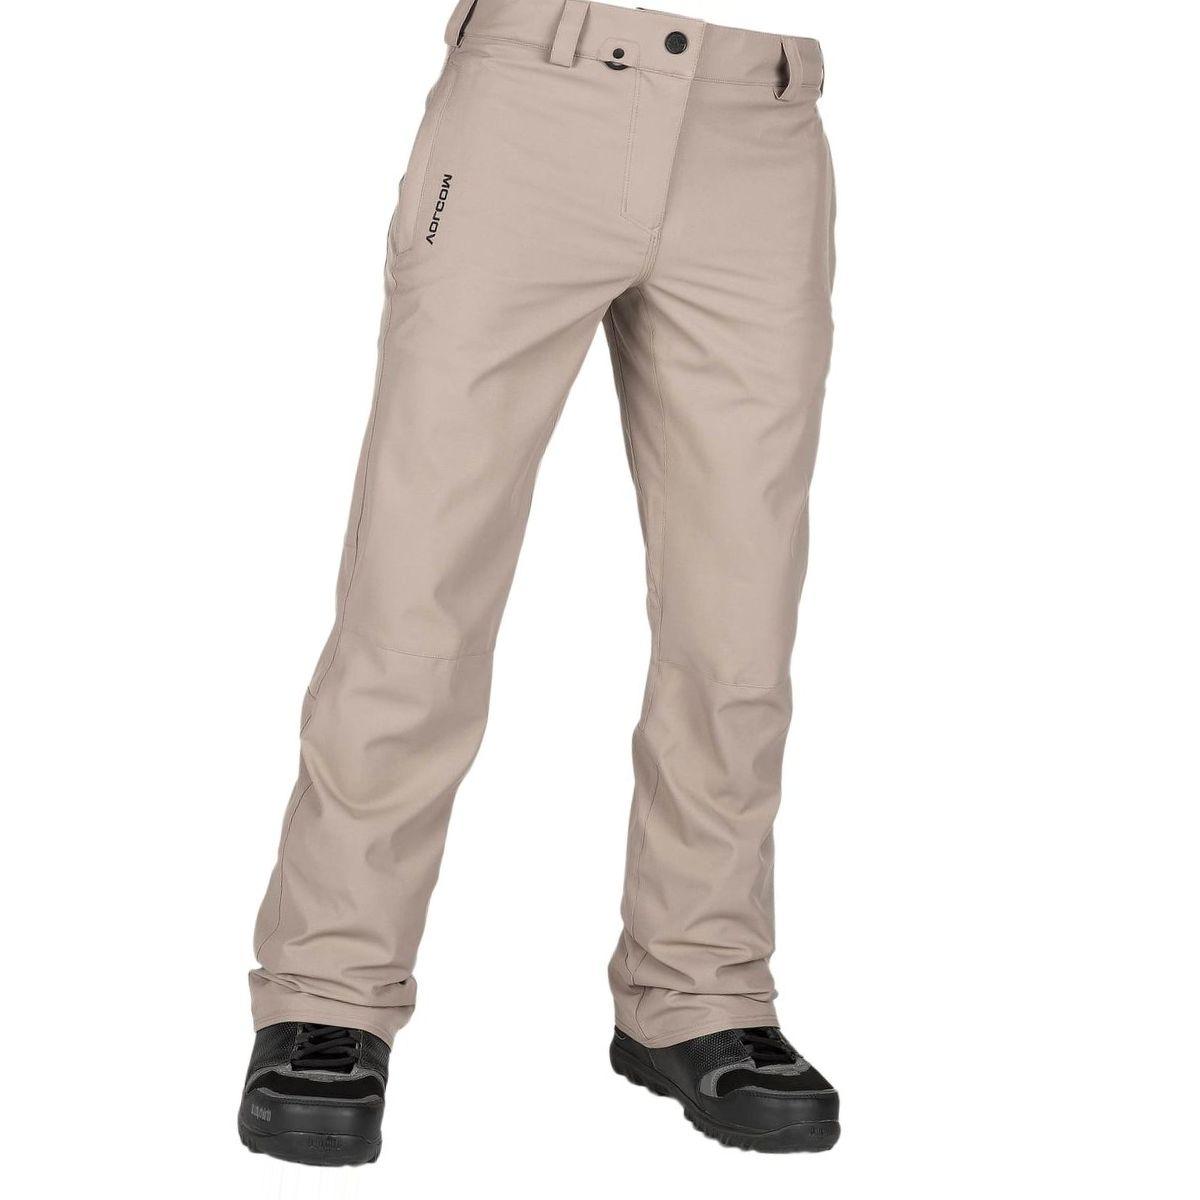 Volcom Klocker Tight Pant - Men's